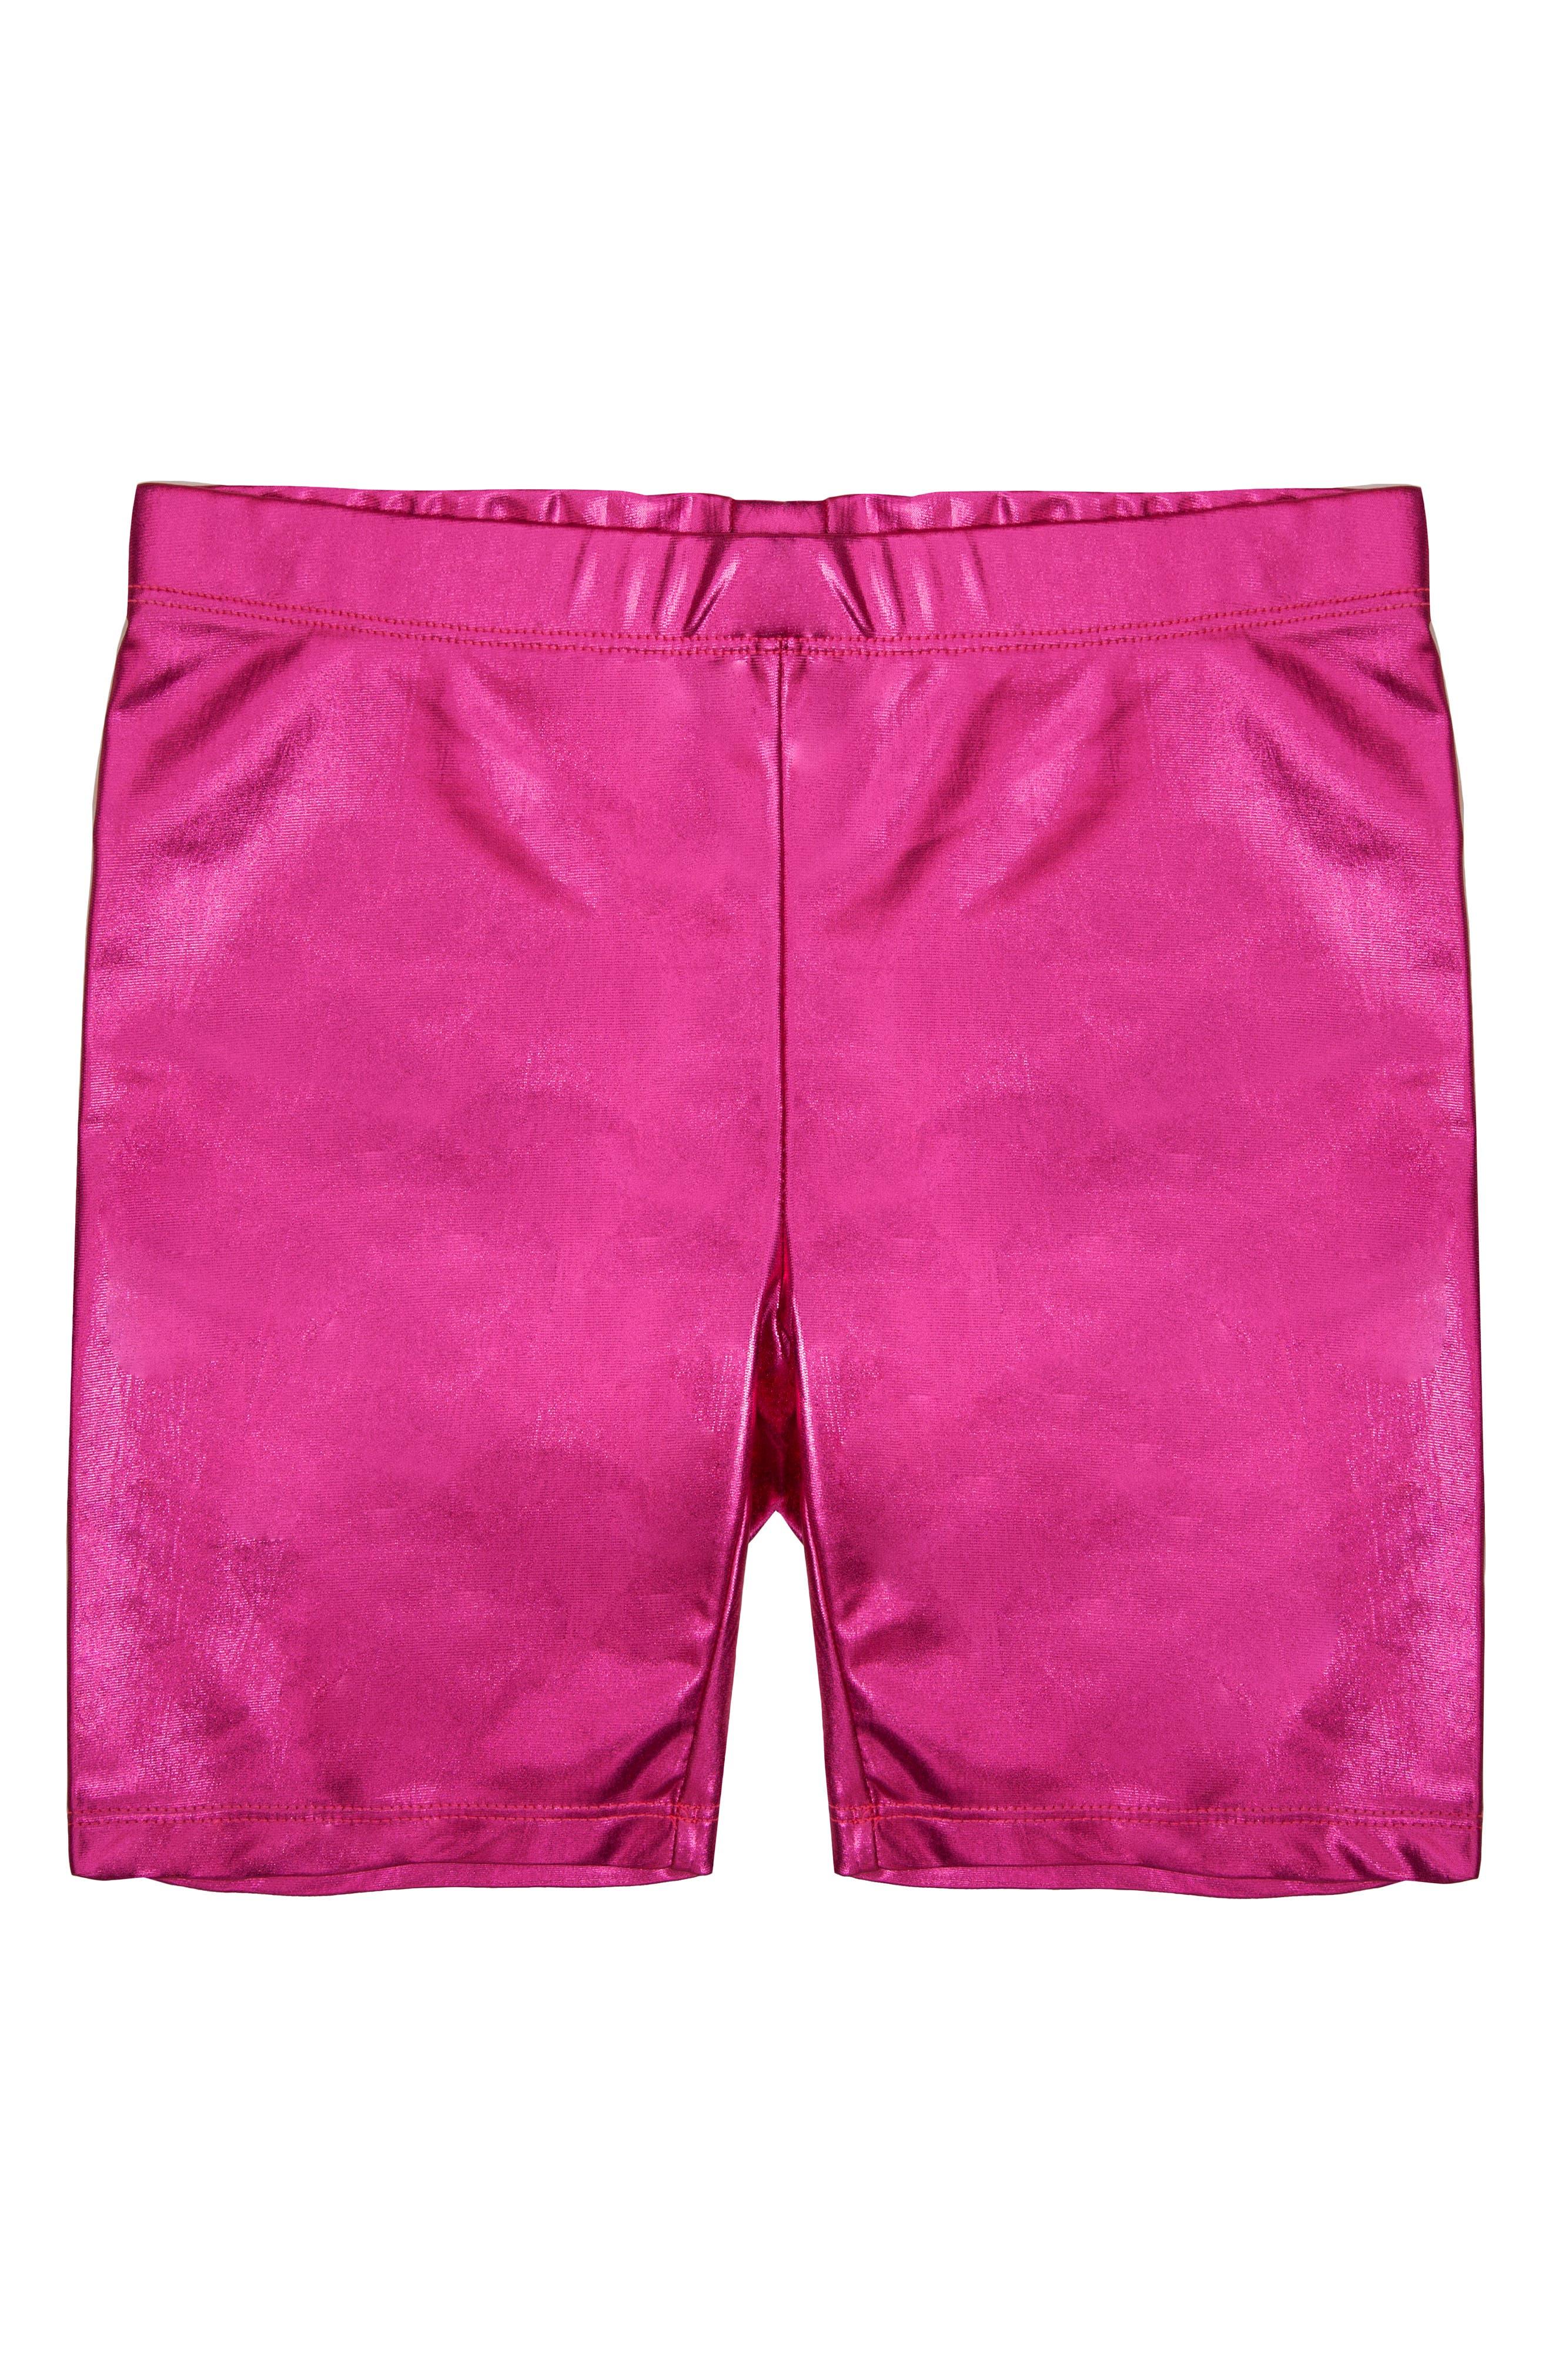 MIA New York Girl's Mia New York Bike Shorts, Size XL - Pink